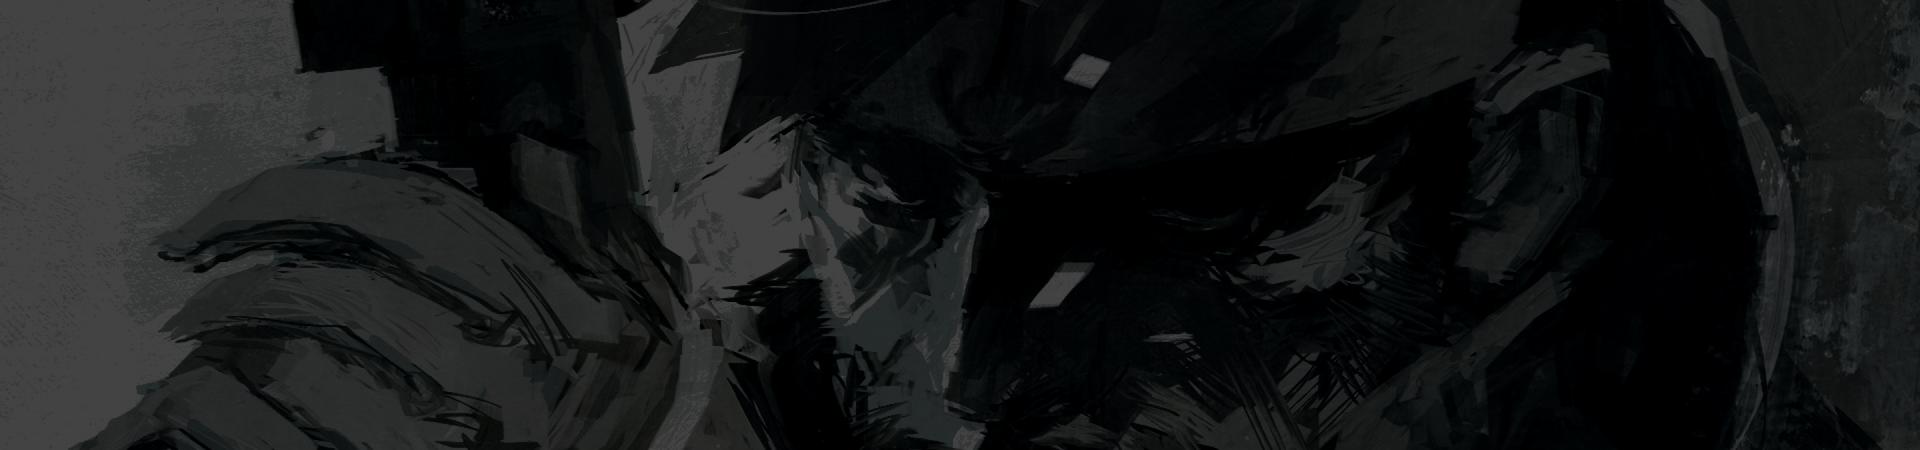 Self-awareness, interactivity, and Metal Gear's three walls